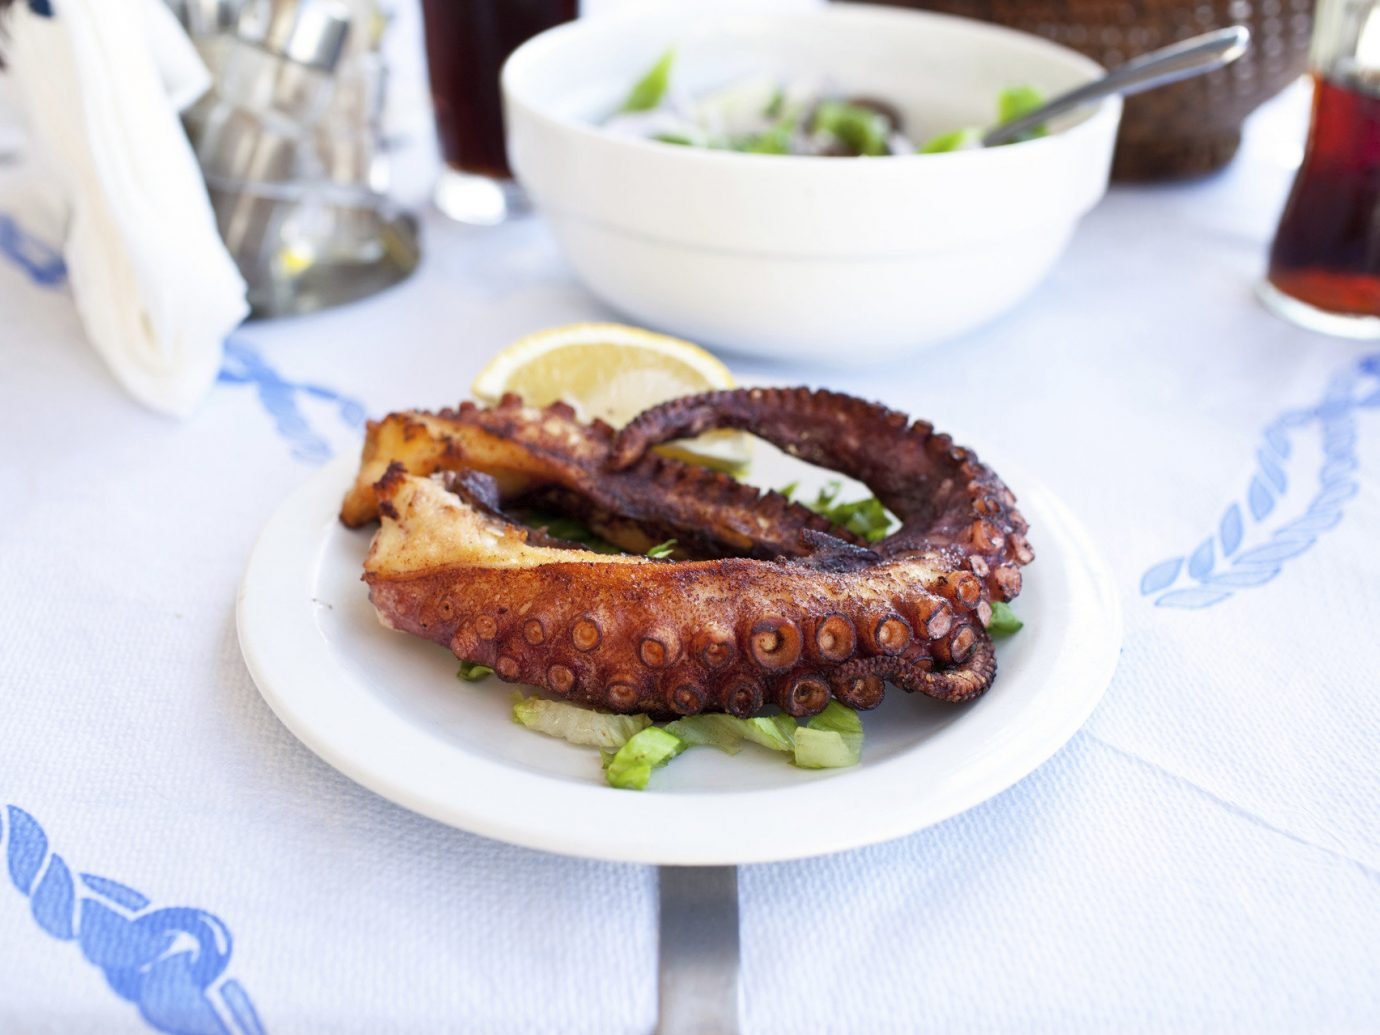 Trip Ideas plate table food dish meat bratwurst produce breakfast meal cuisine sausage fried food vegetable